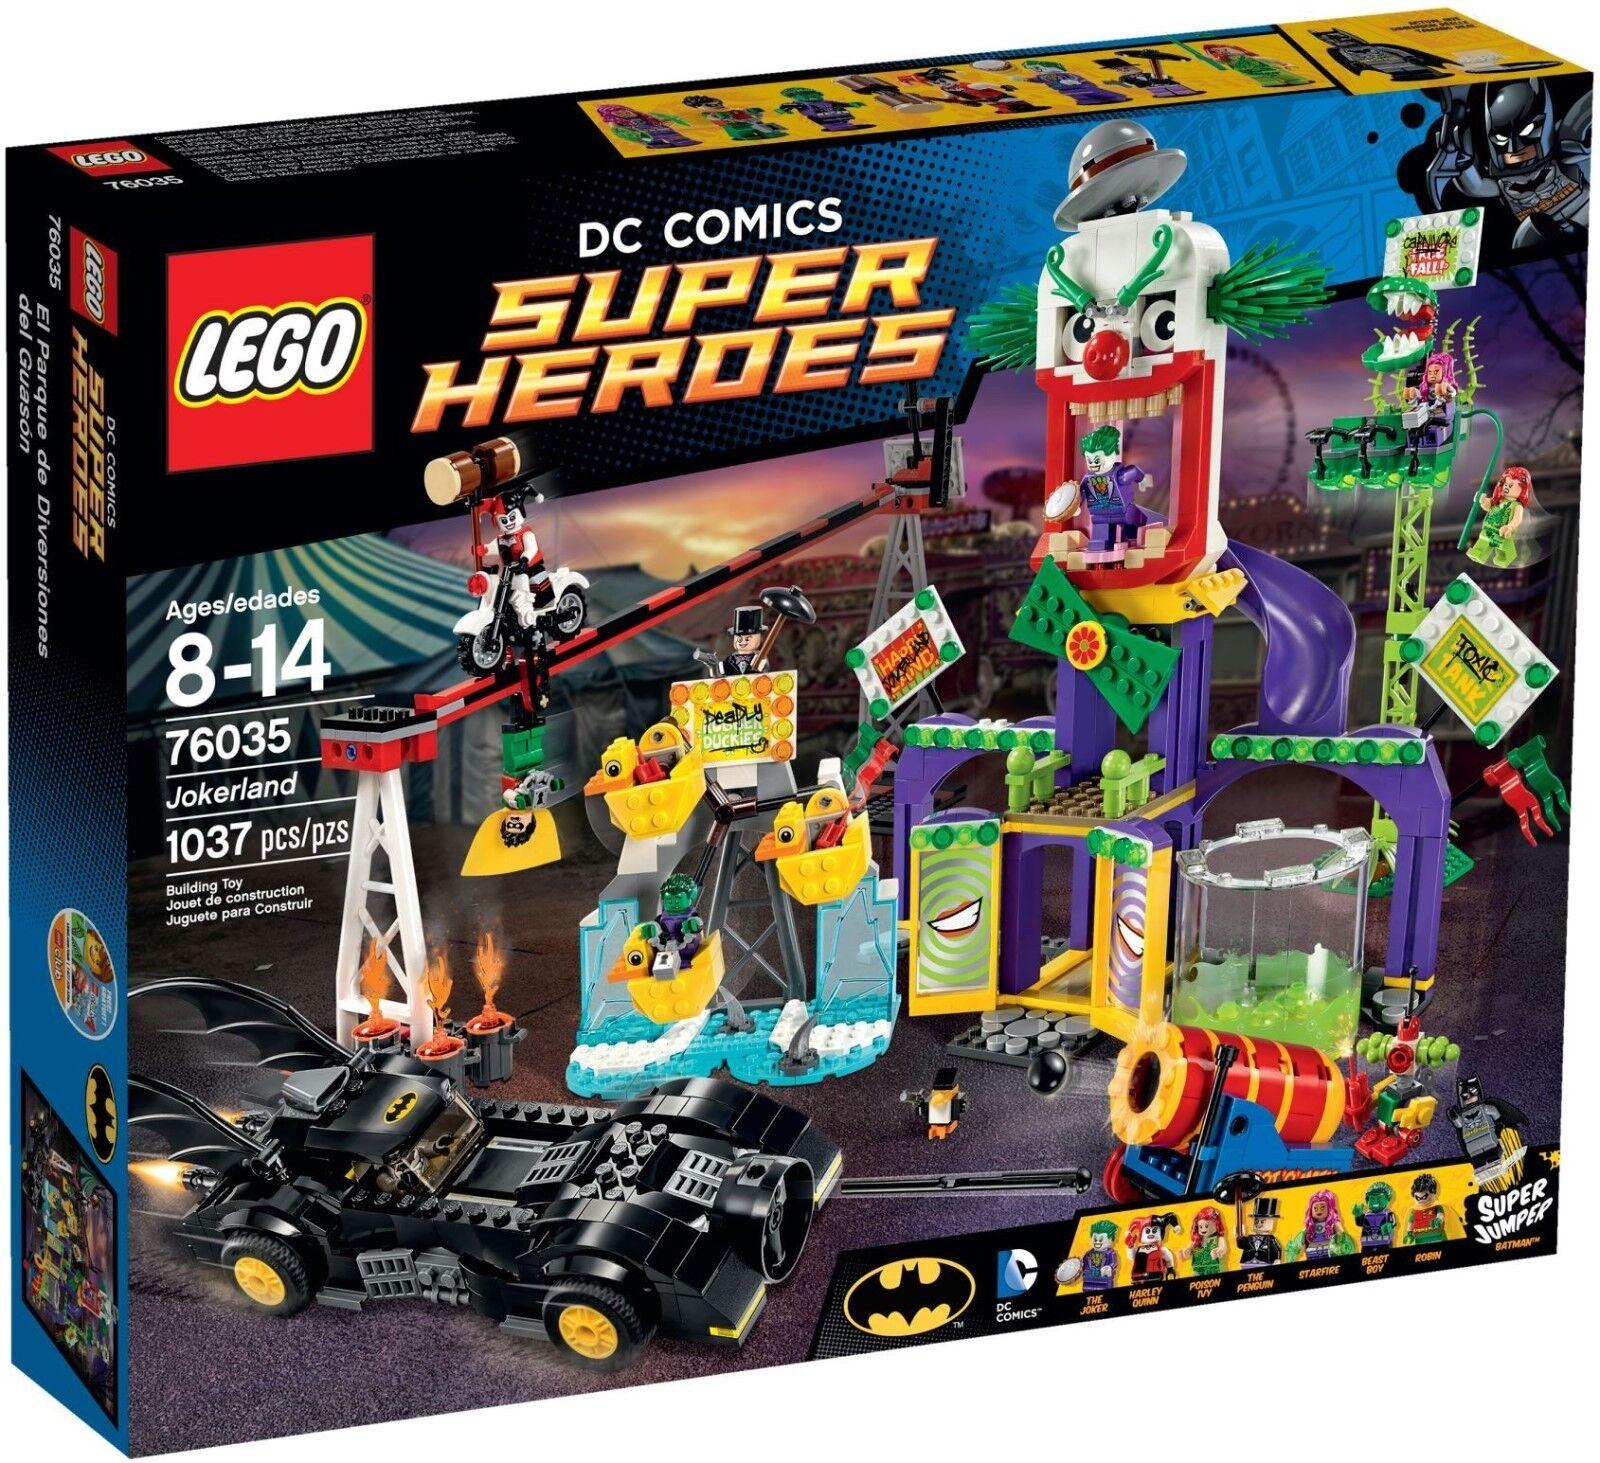 LEGO® 76035 Joker Land Batman Robin Batmobil Neu & OVP Serie 76034 76036 76038